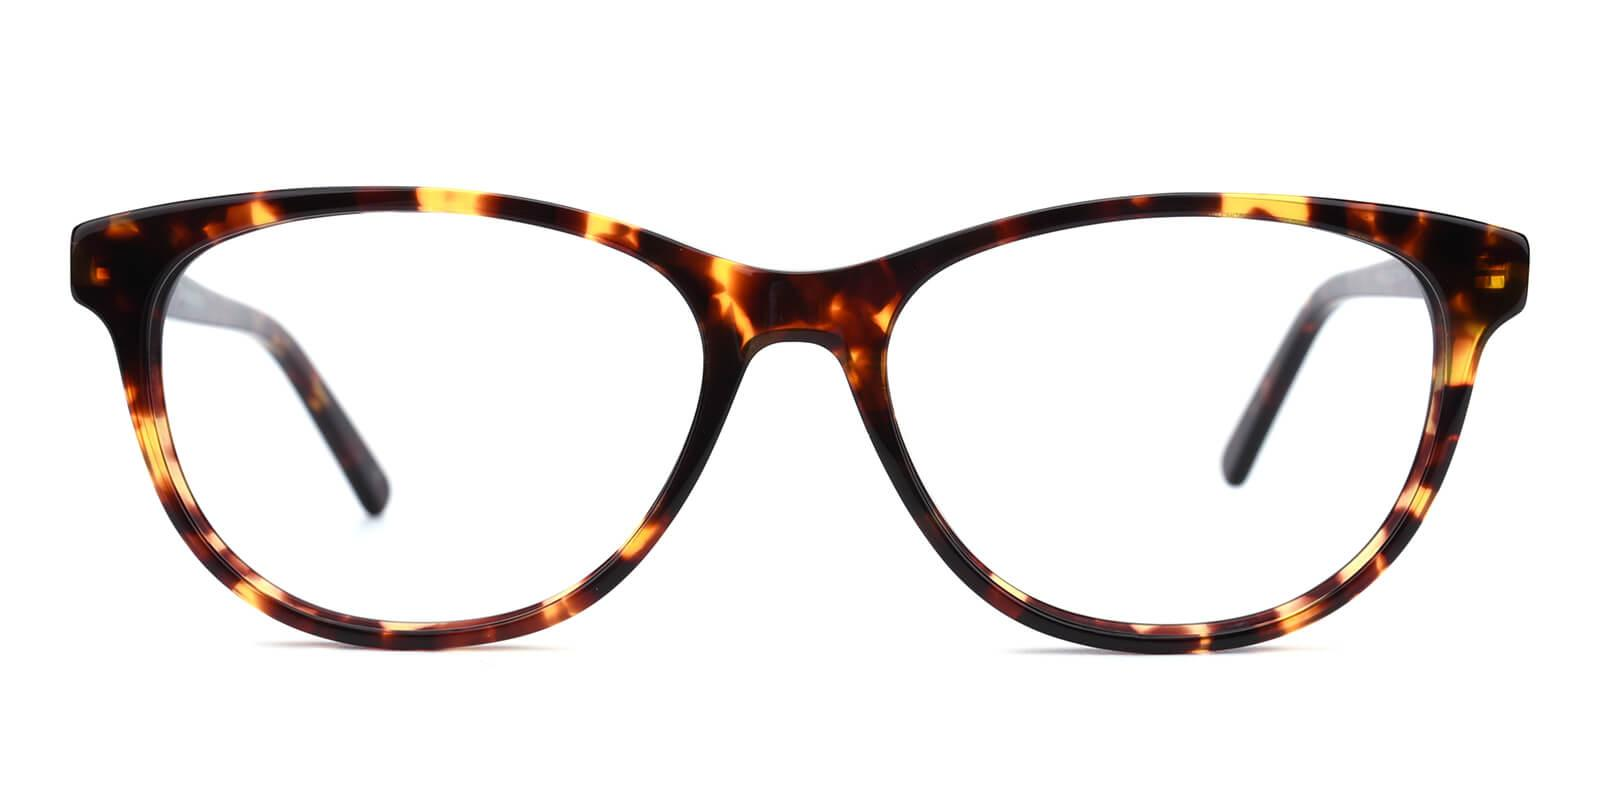 Neptunus-Pattern-Cat-Acetate-Eyeglasses-additional2